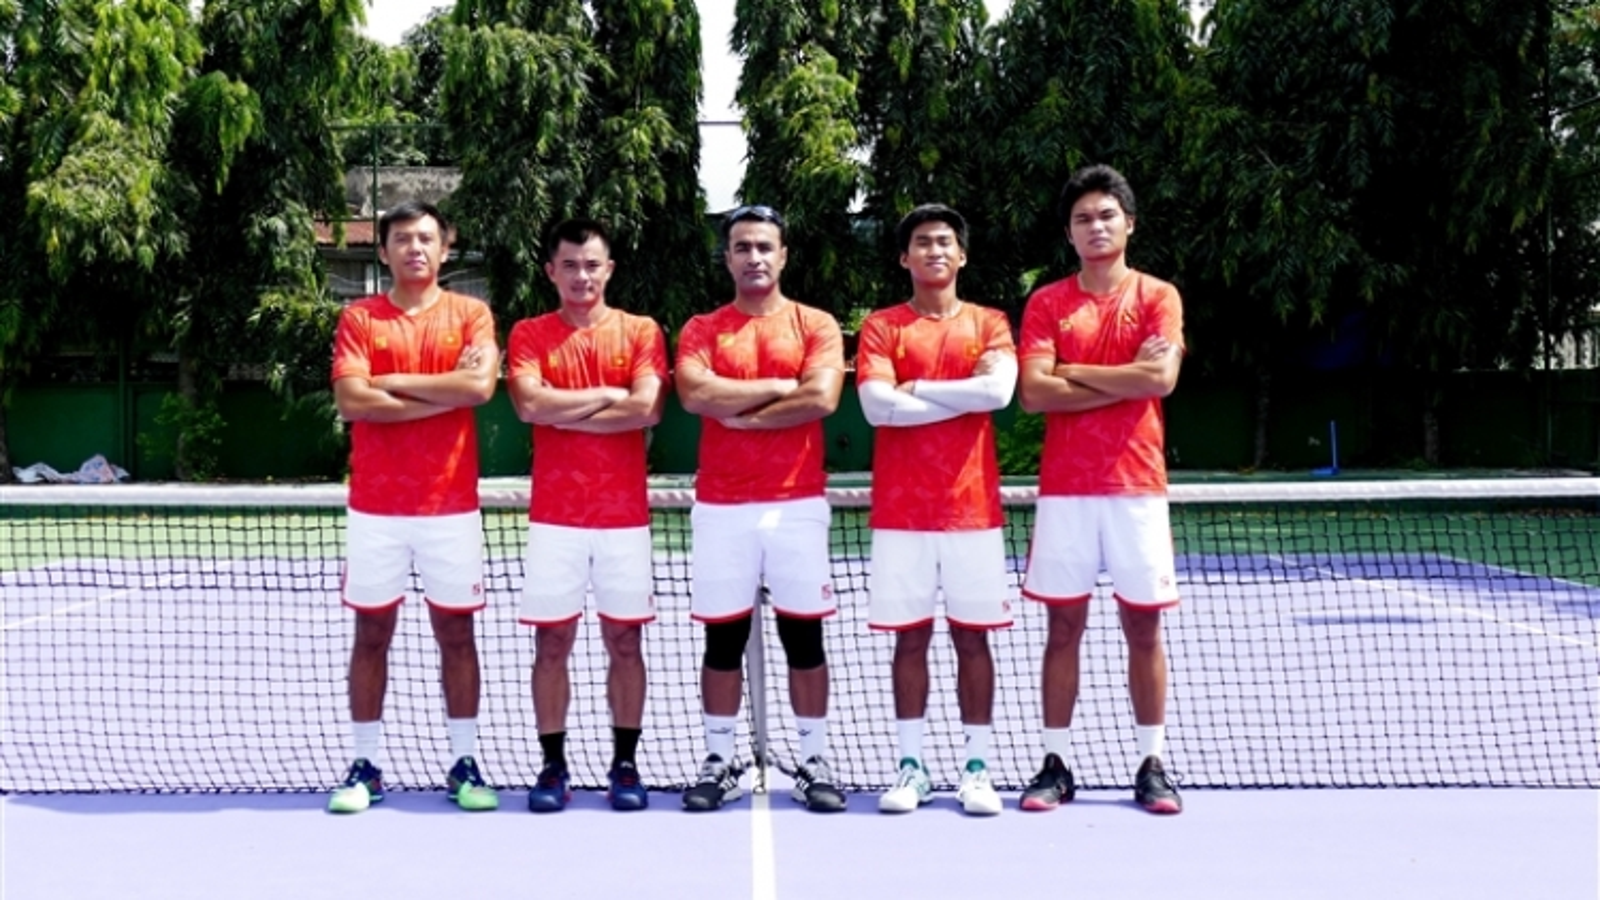 Vietnam tennis team to compete at Davis Cup in Jordan